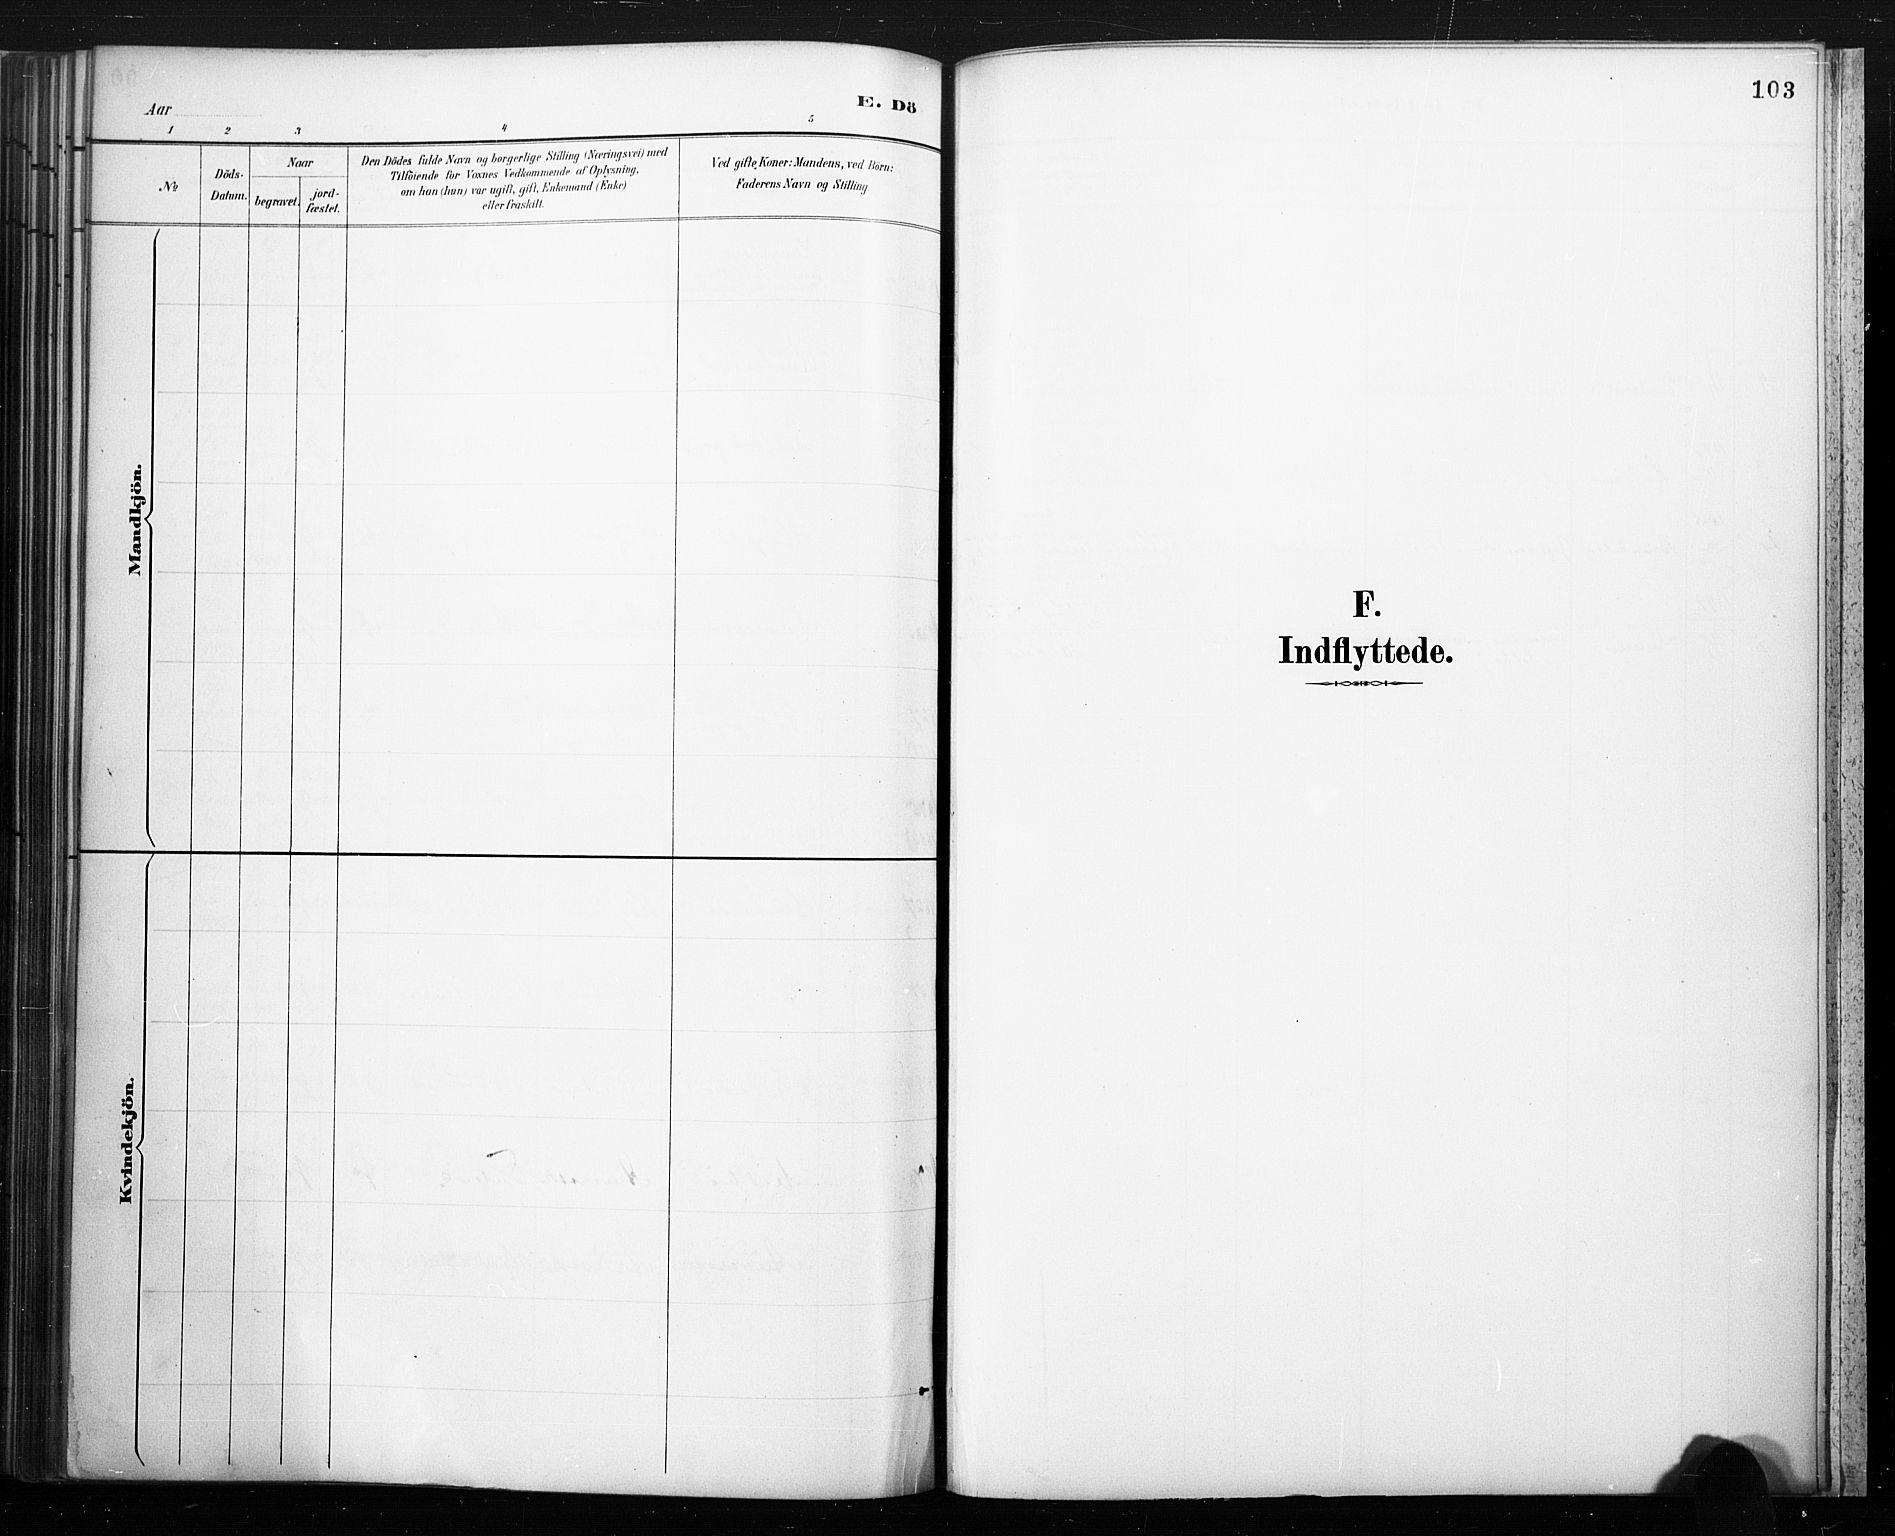 SAKO, Lårdal kirkebøker, F/Fc/L0002: Ministerialbok nr. III 2, 1887-1906, s. 103